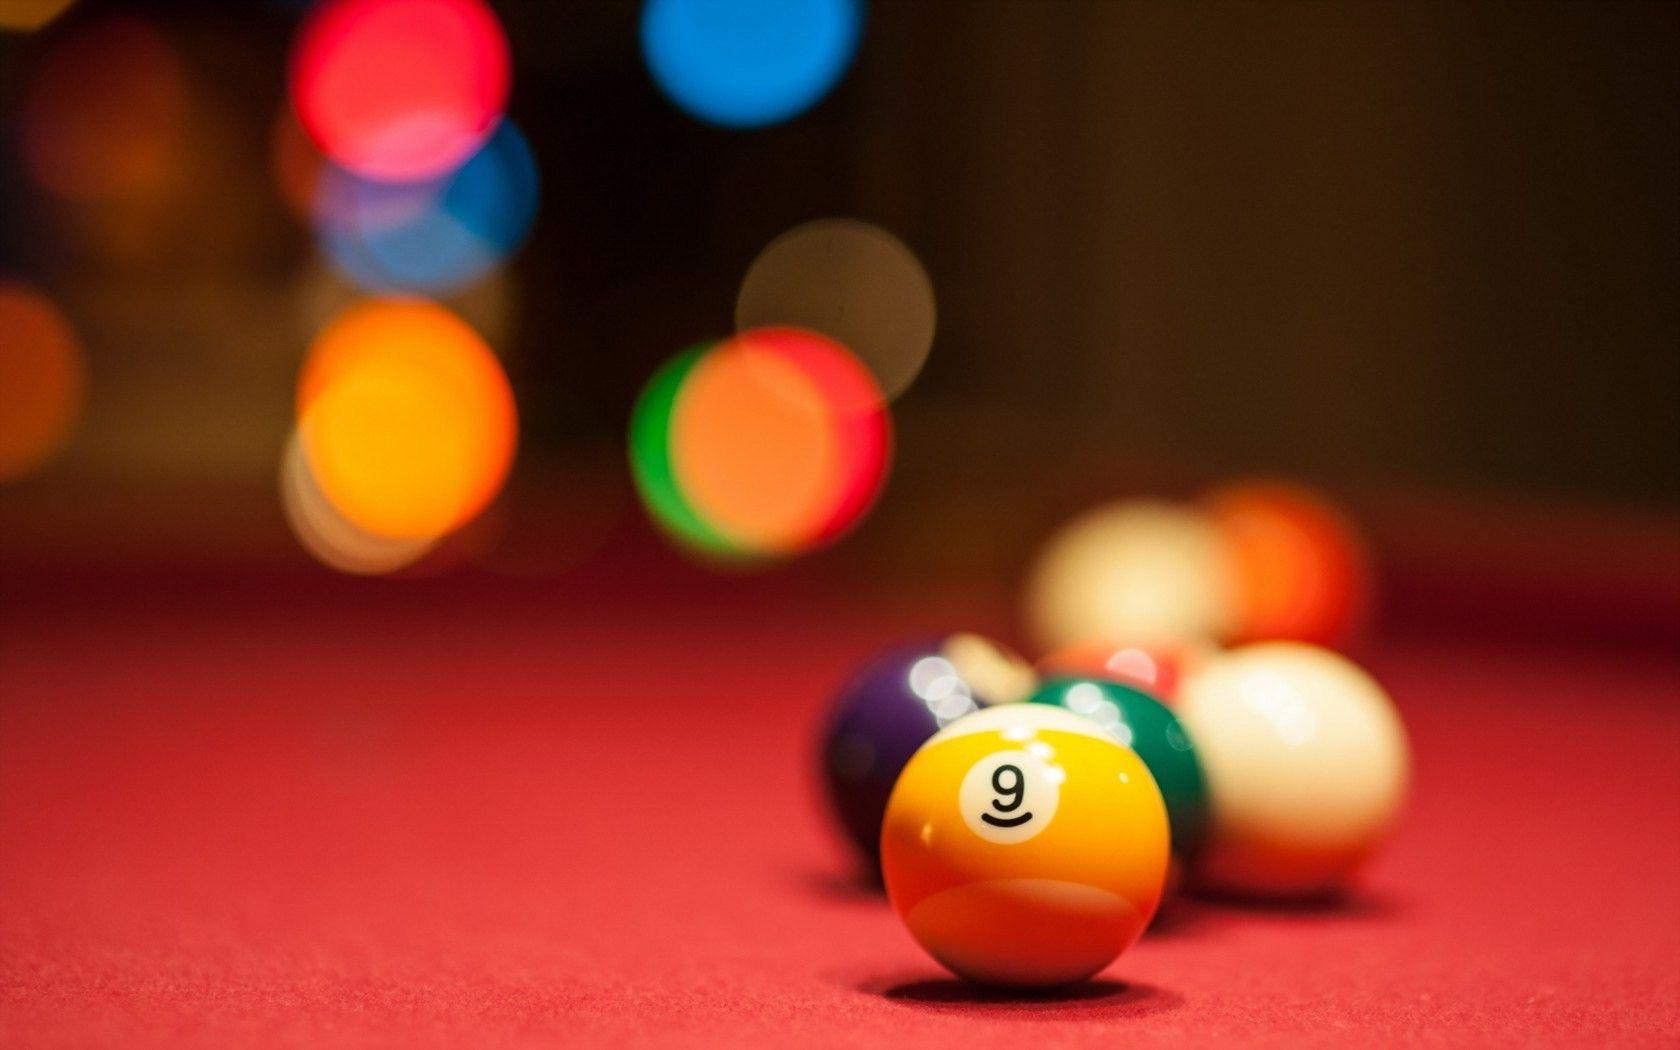 3D Billiard Balls Wallpaper